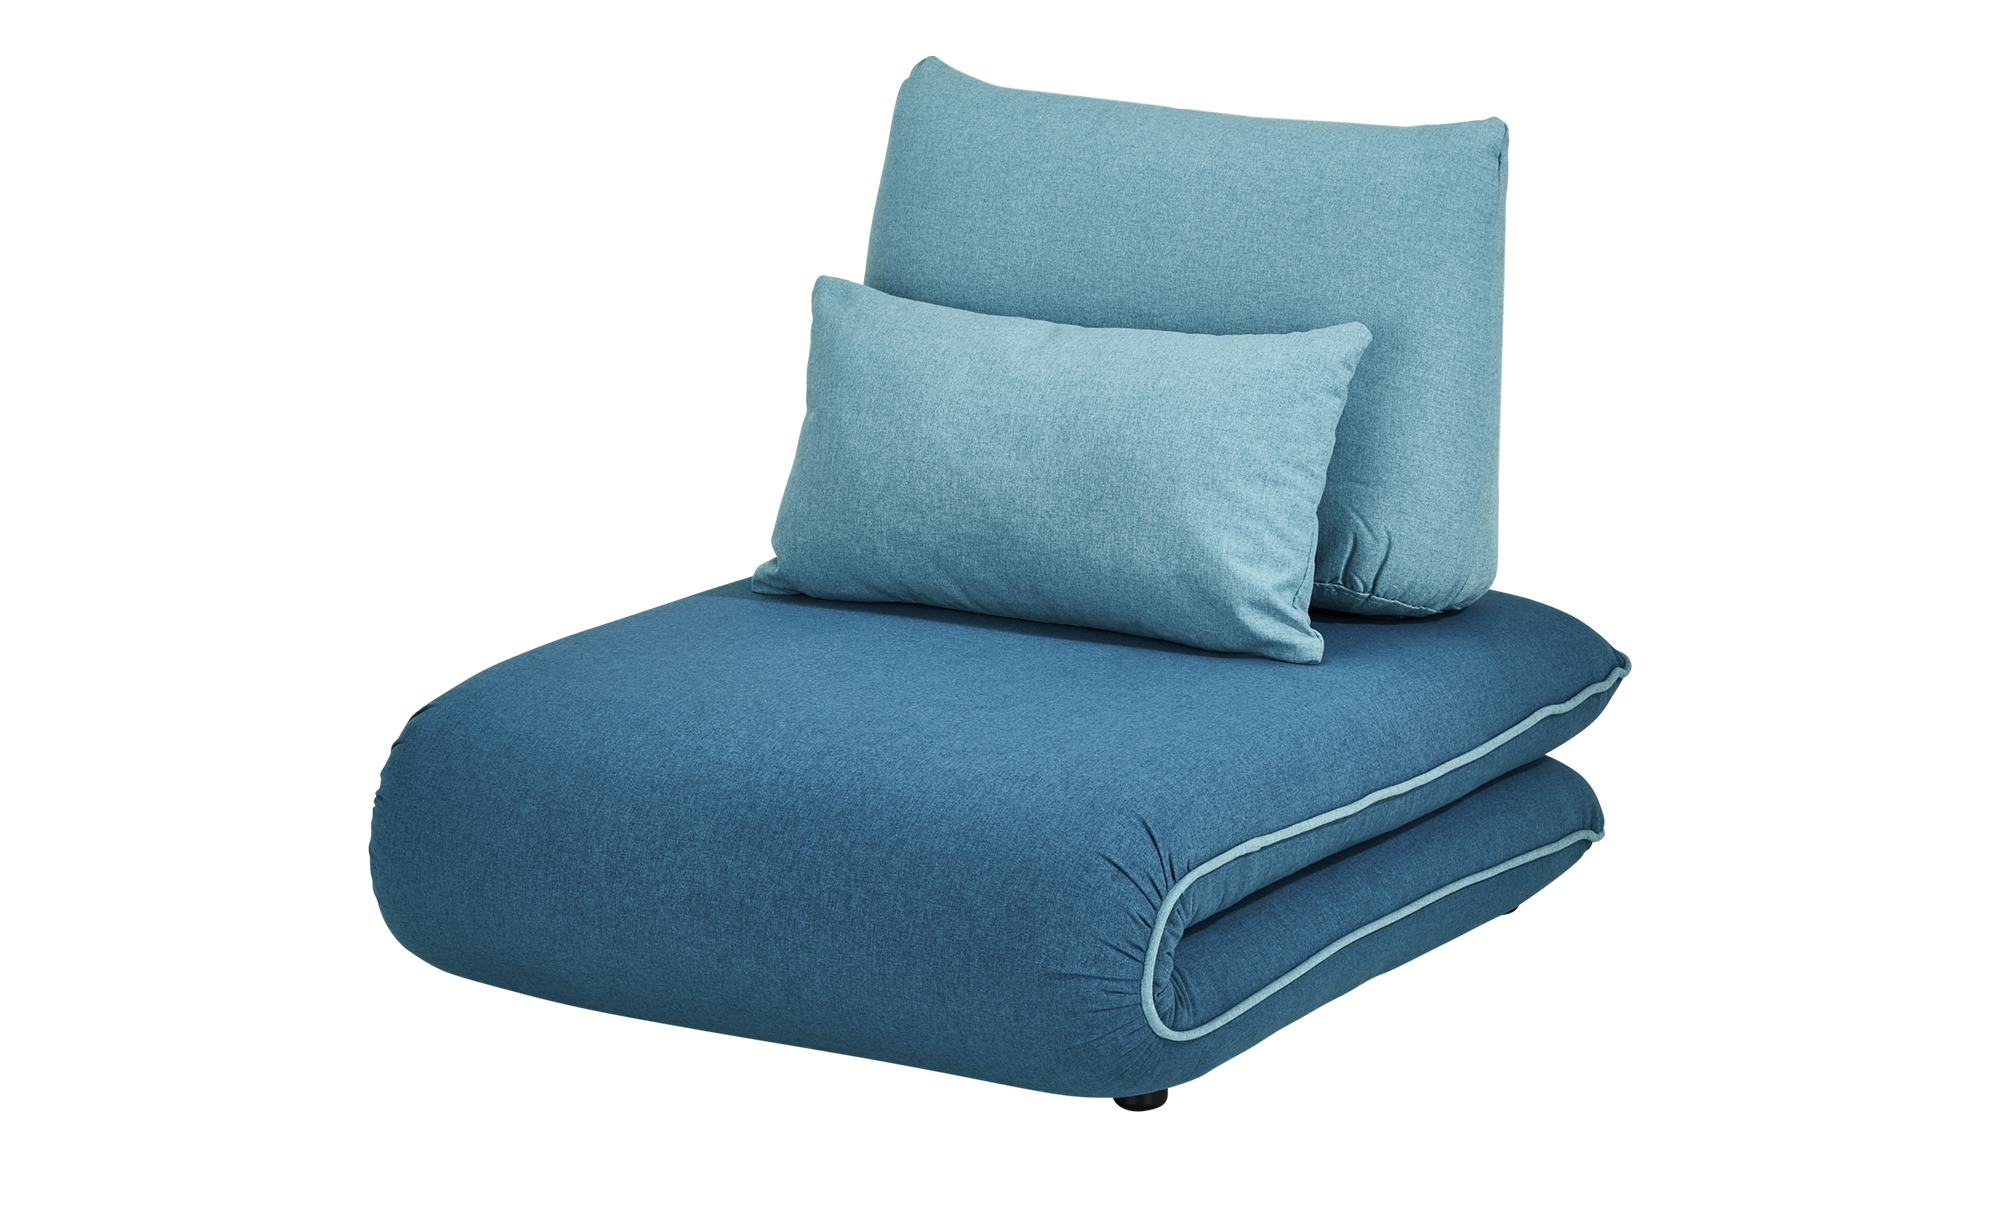 Schlafsessel  Beatrix ¦ Maße (cm): B: 82 H: 73 T: 98 Polstermöbel > Sessel > Schlafsessel - Höffner